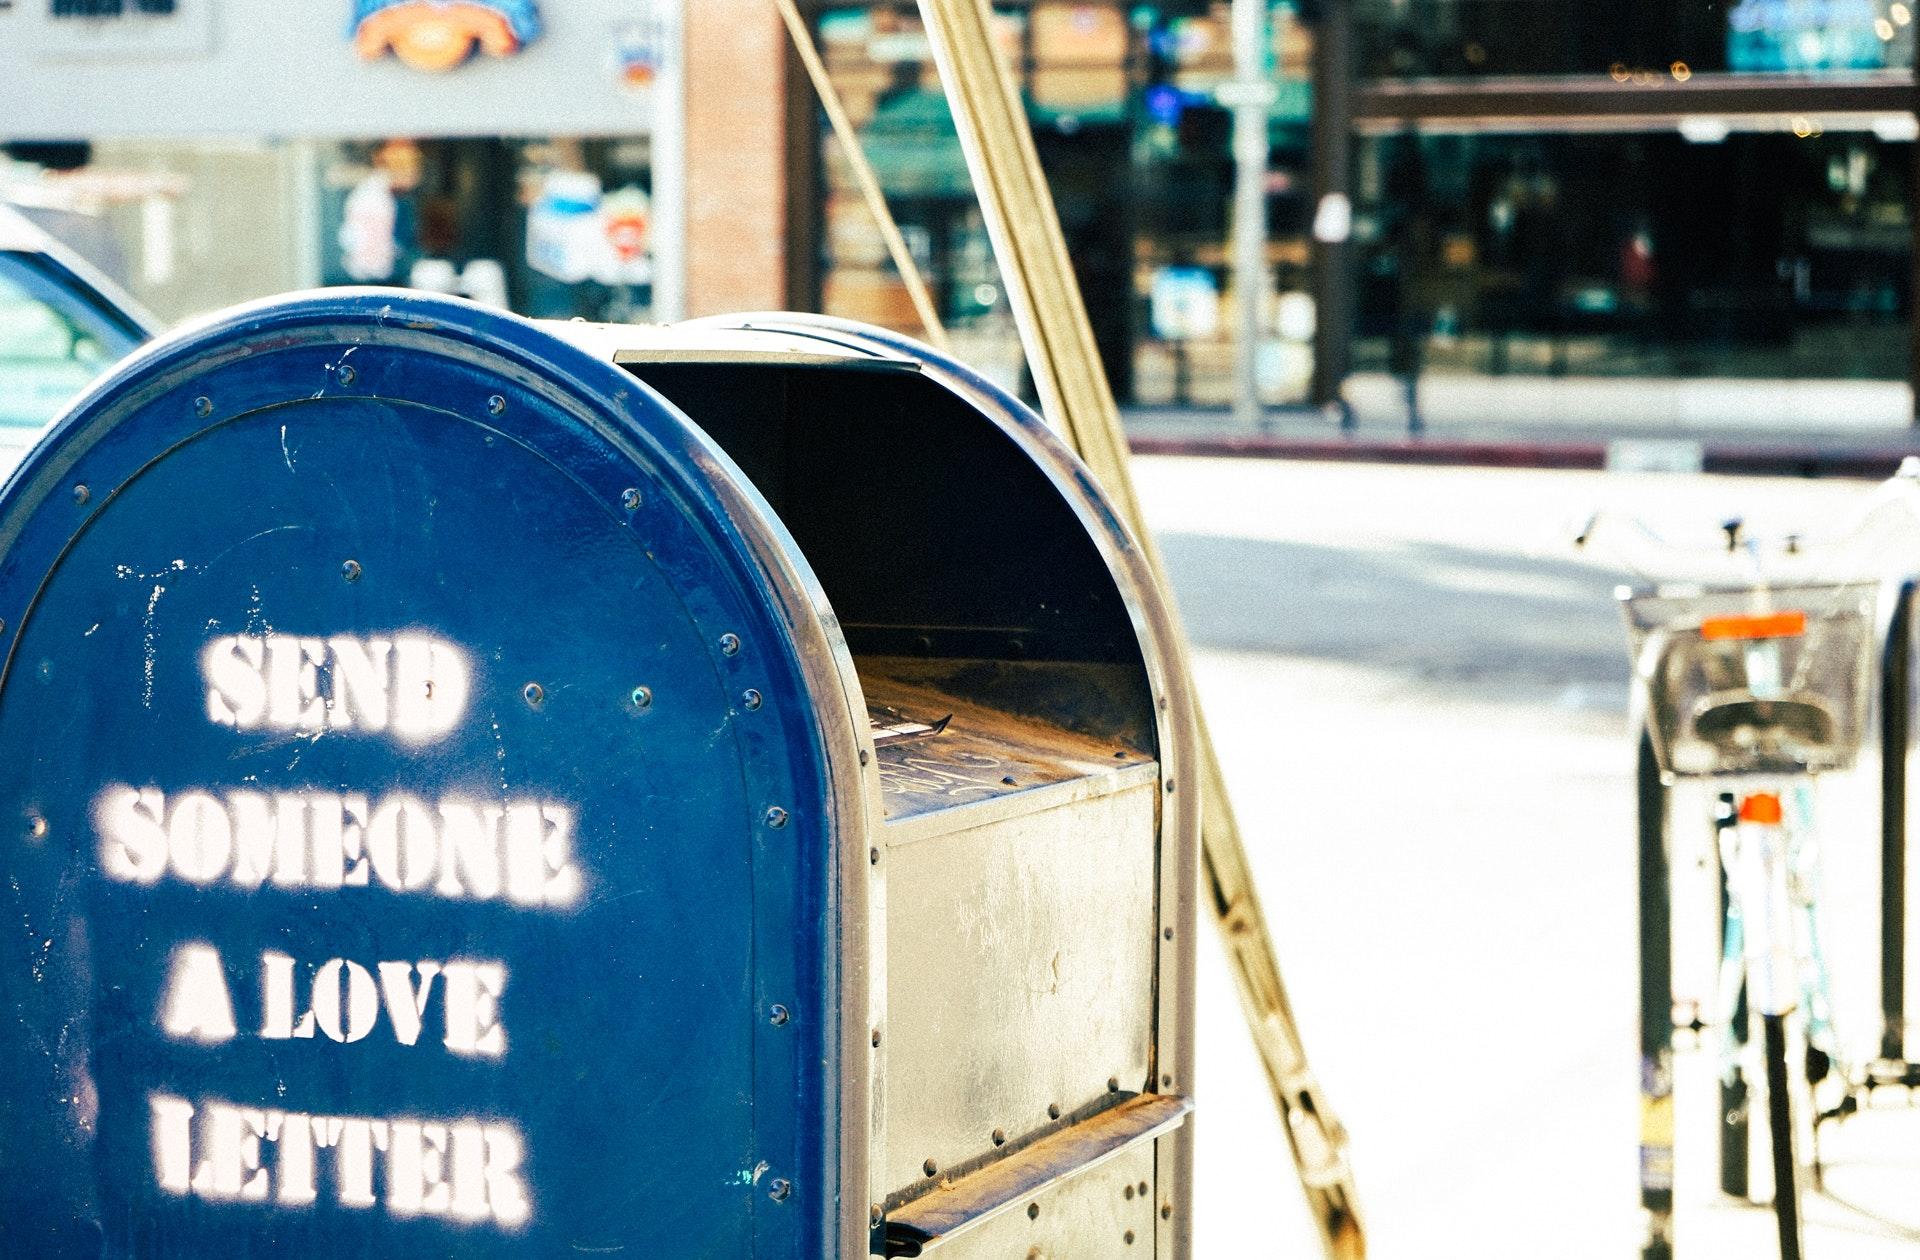 letter-mail-mailbox.jpg